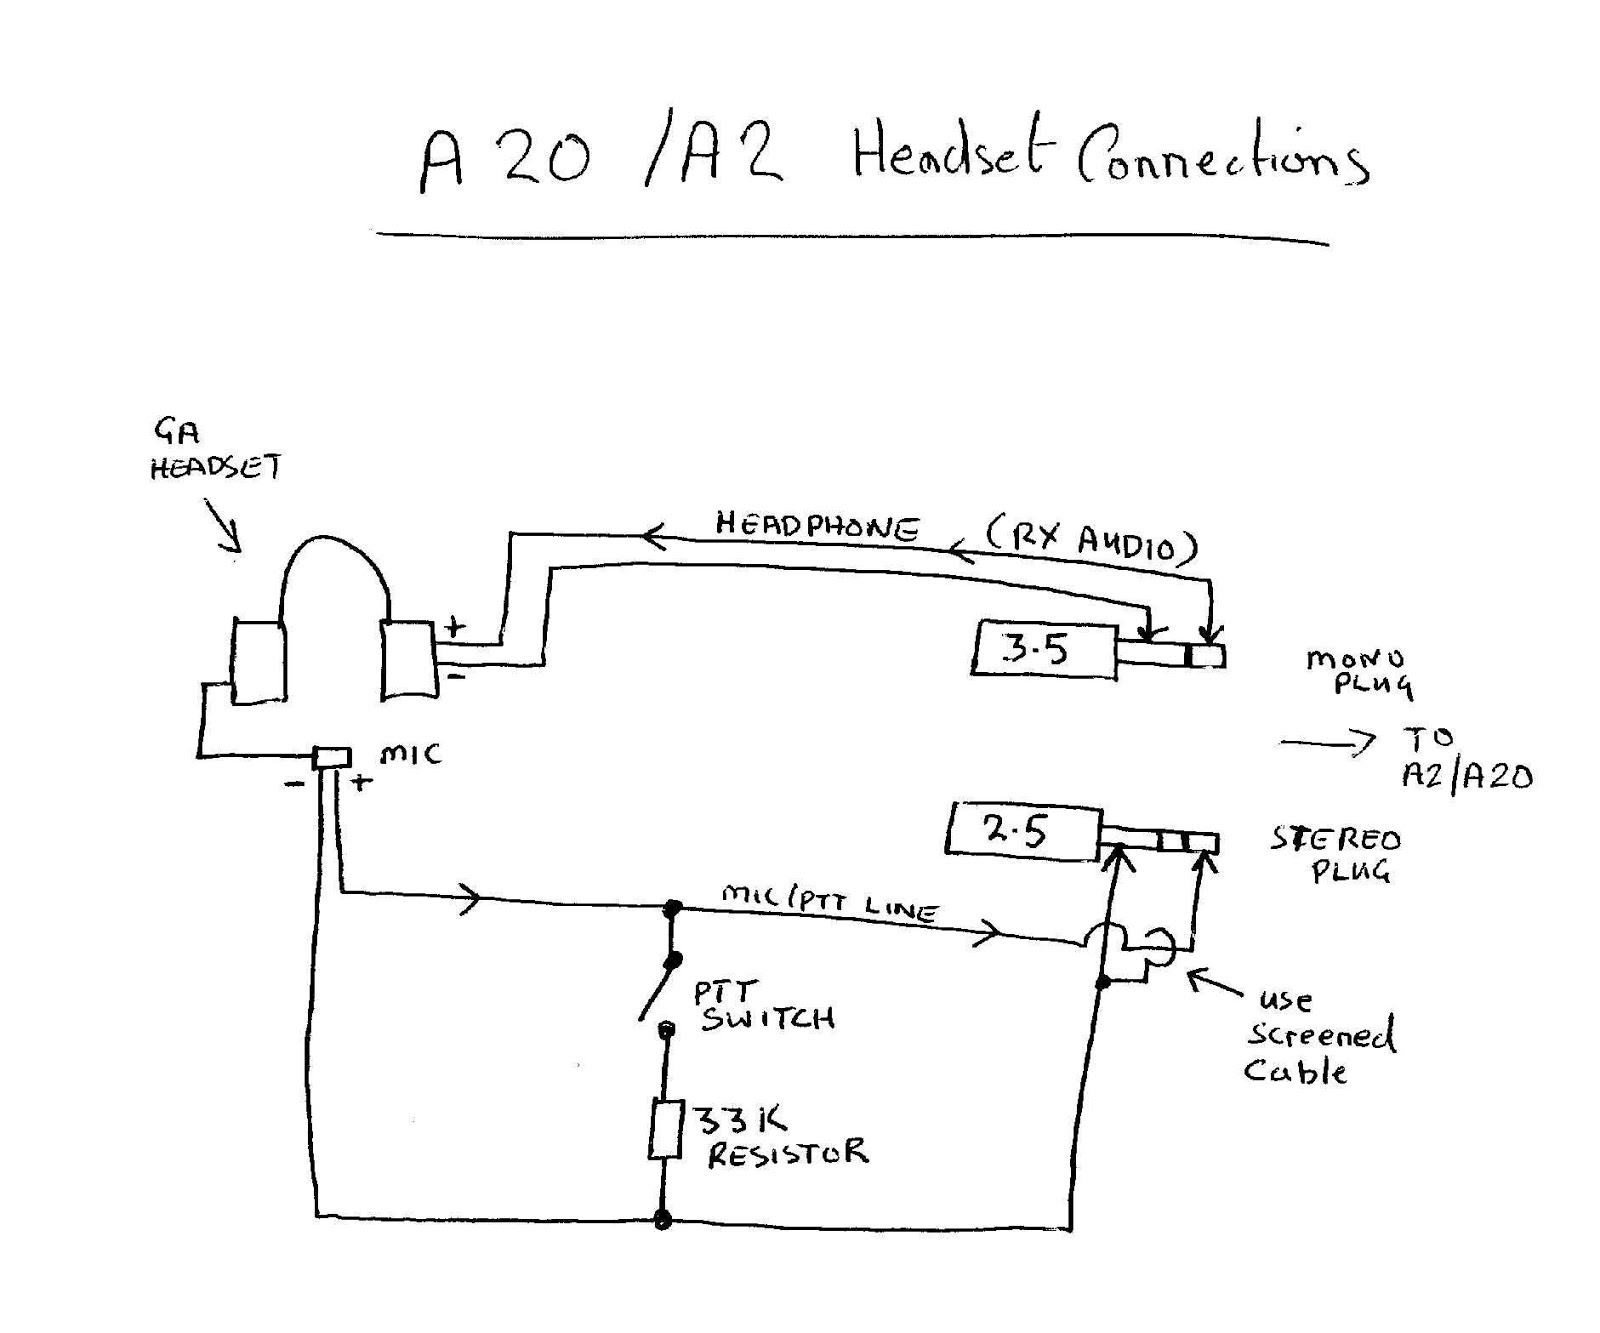 Cb Mic Wiring Diagrams Astatic Diagram Wire Maxon Mcb 30 5 Pin Xlr Database Uniden Microphone 3